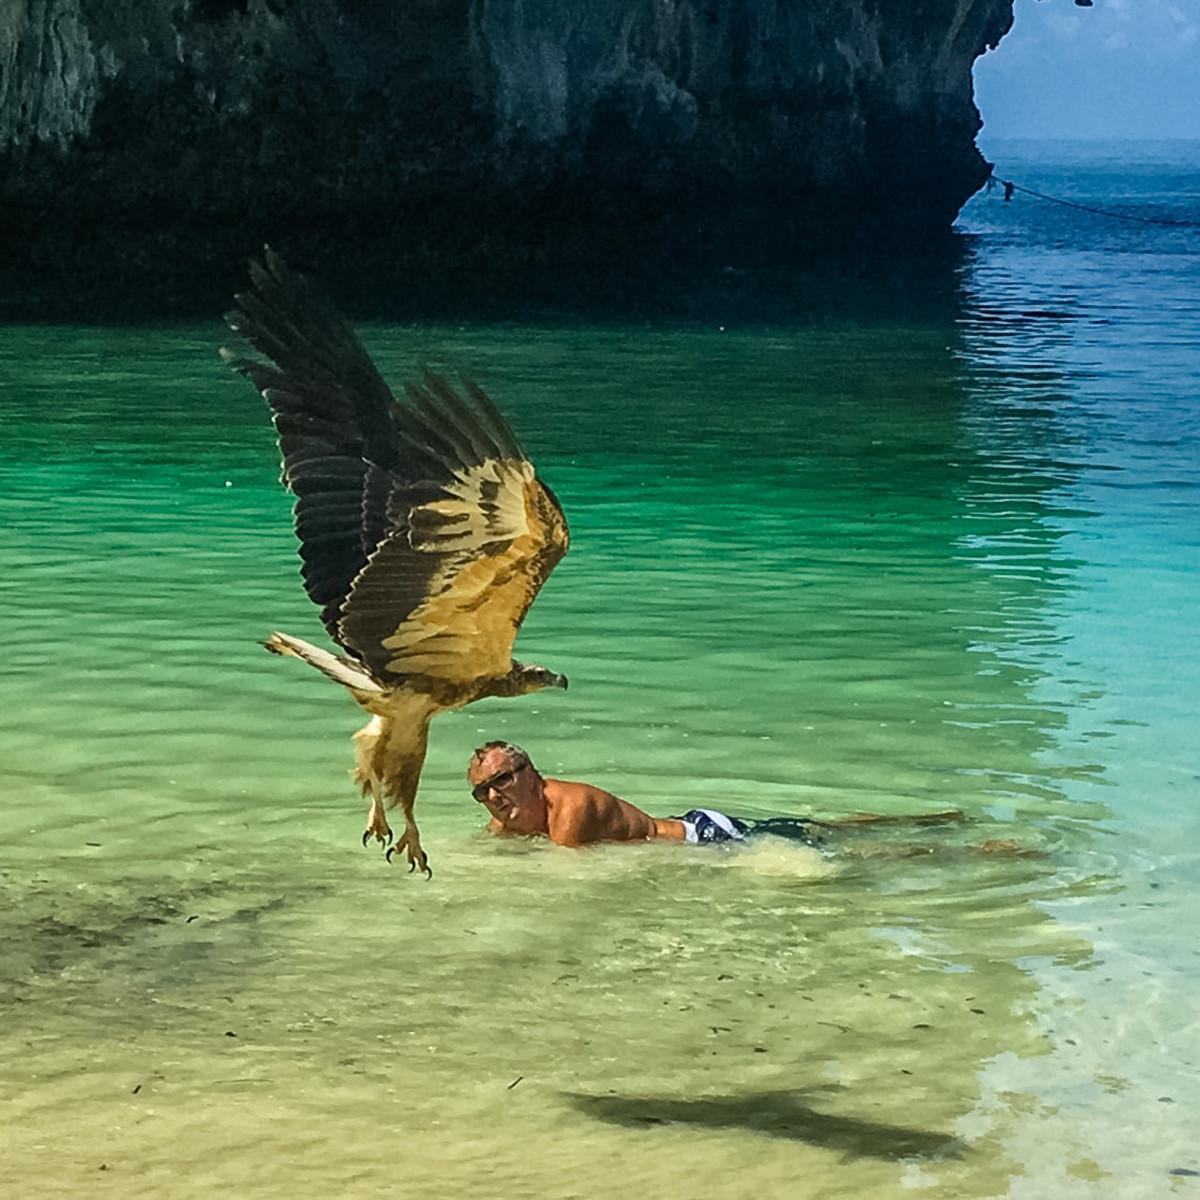 Bird of prey mistakes John for school of fish